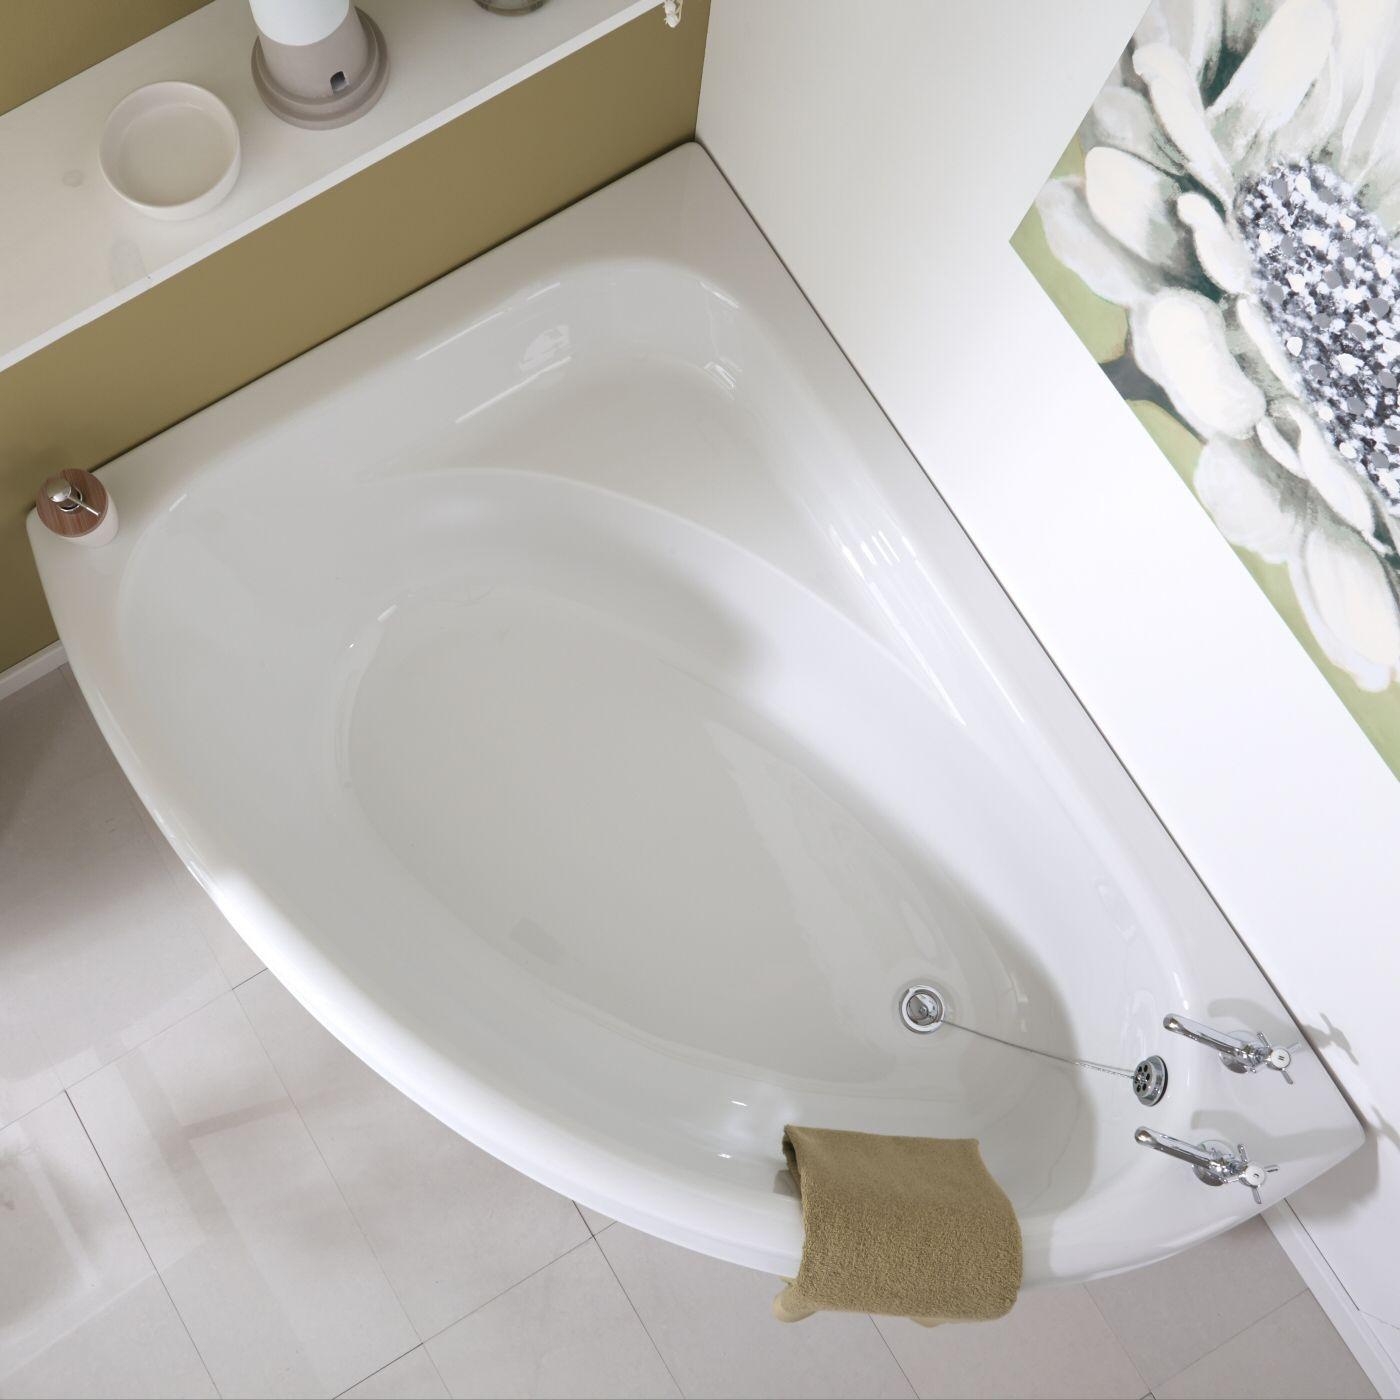 Baignoire d 39 angle gauche 150x102cm - Installer une baignoire d angle ...